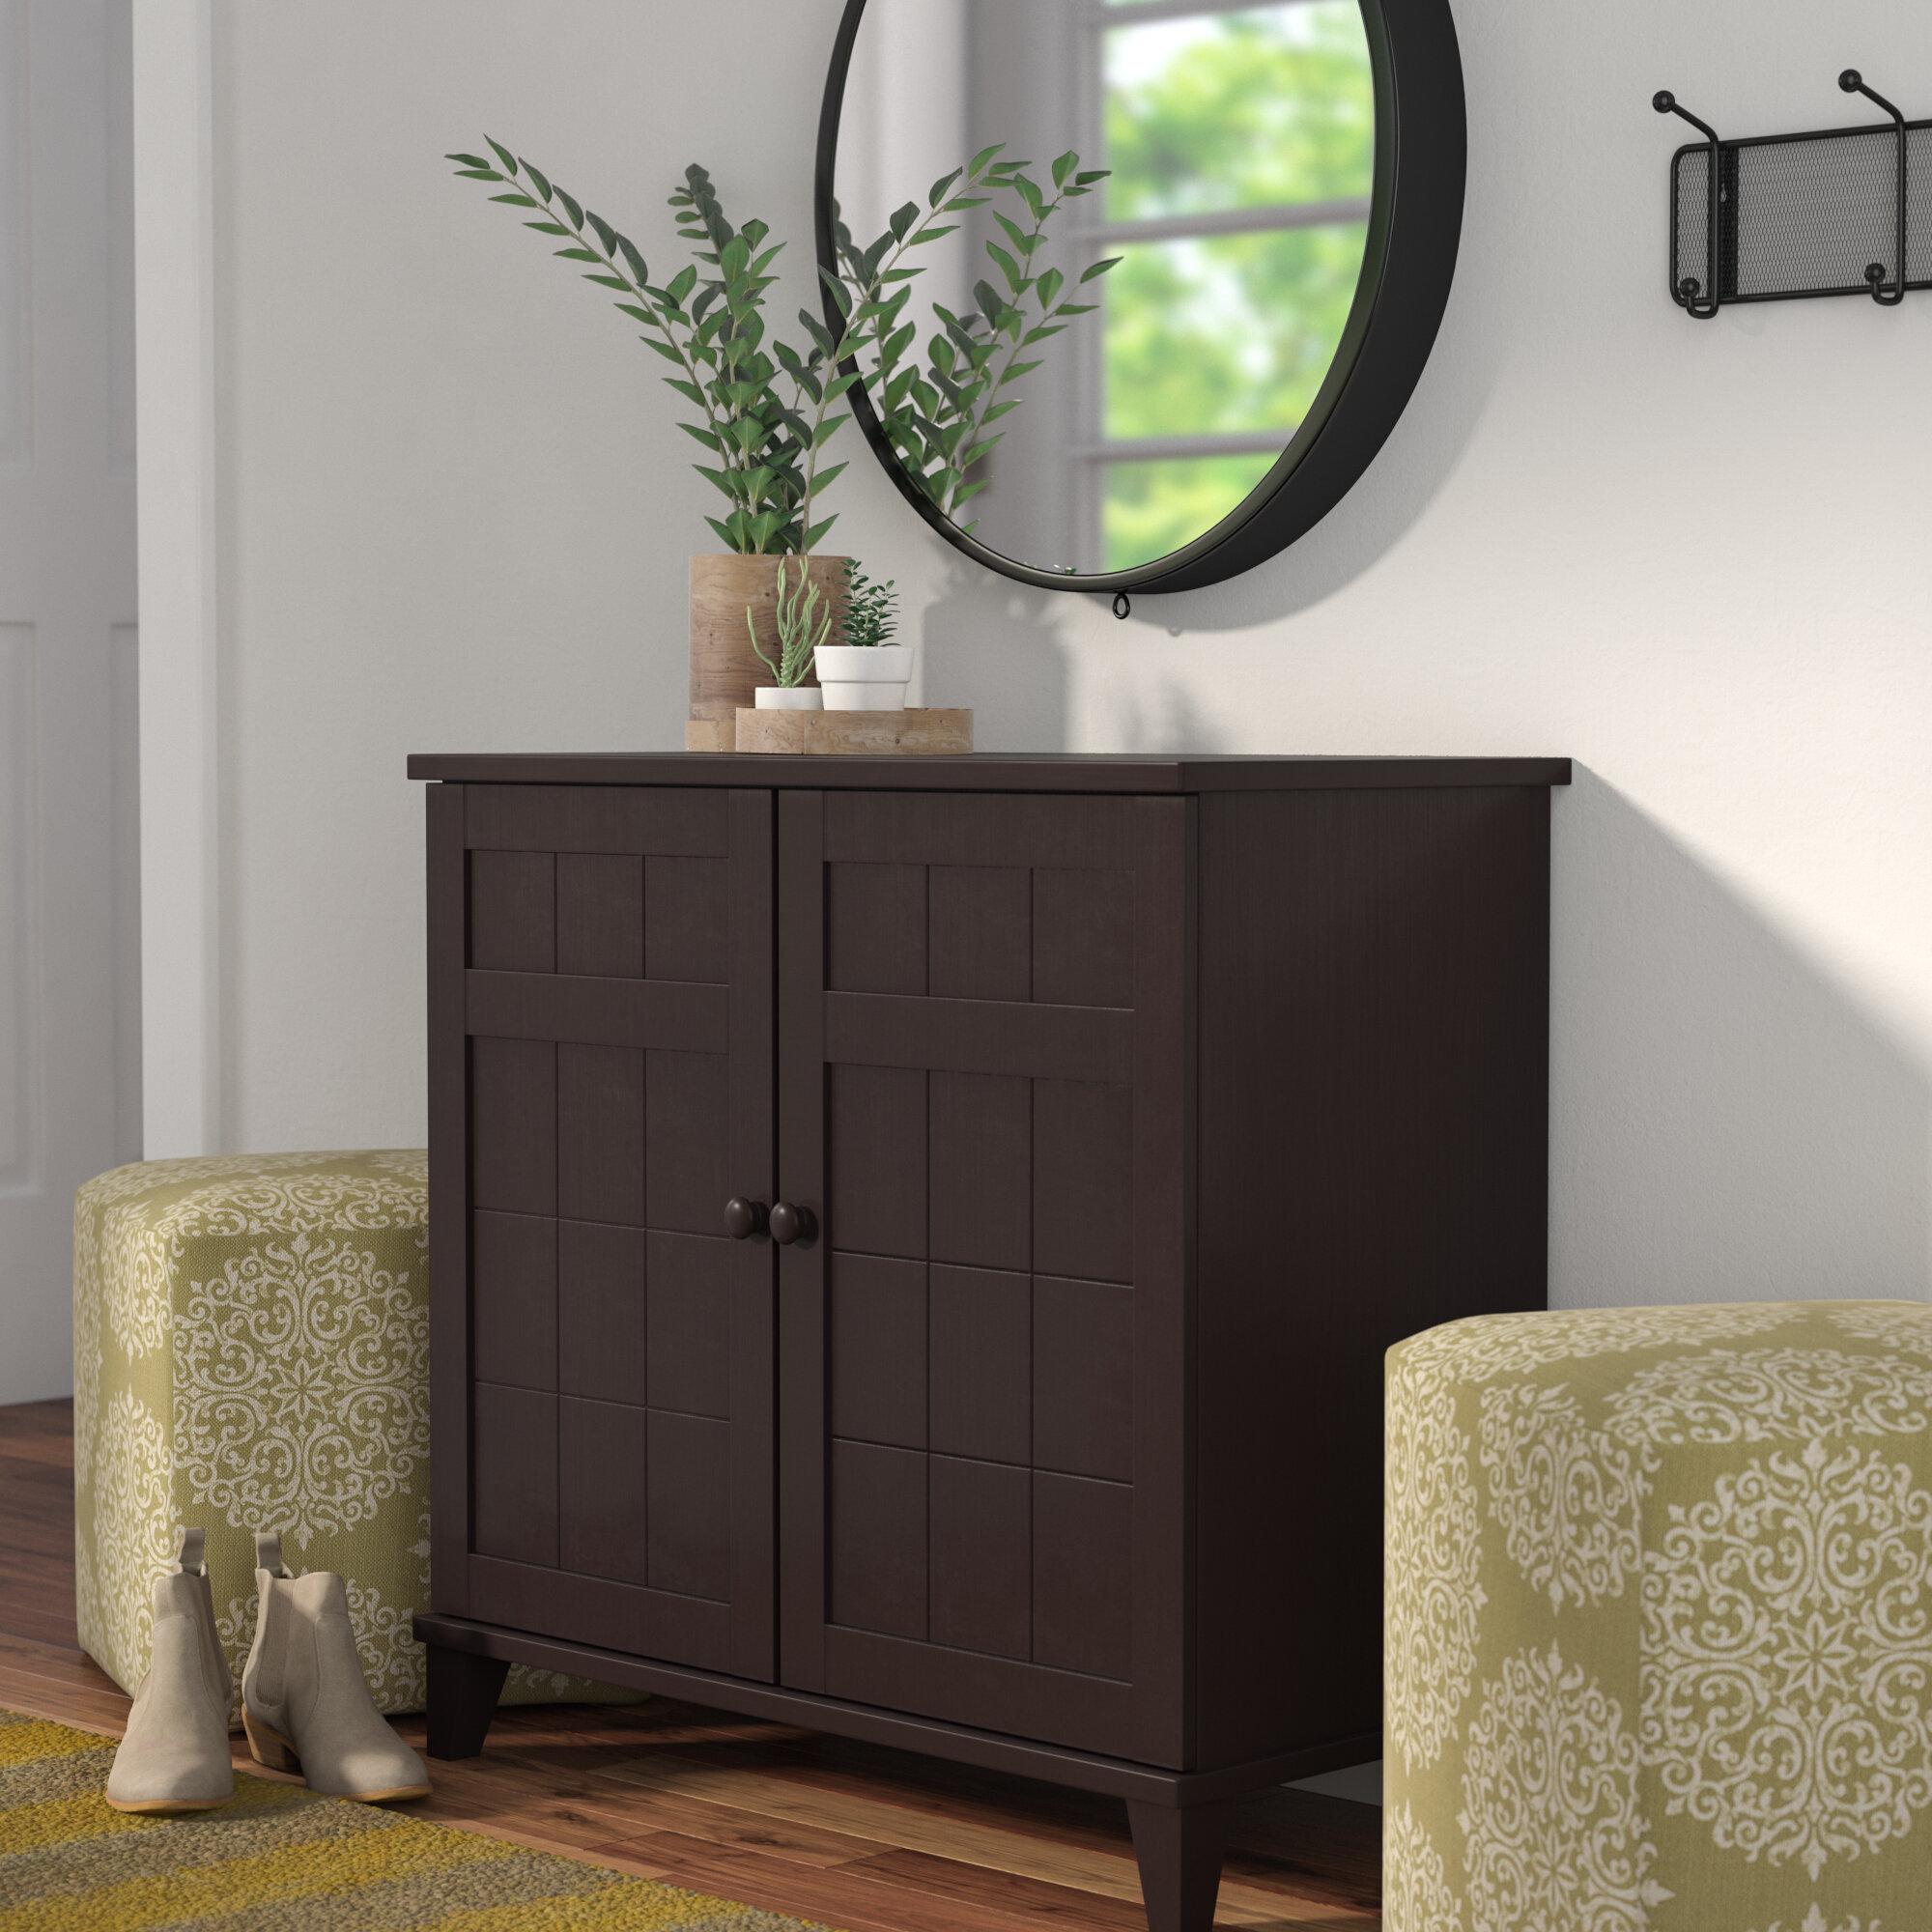 Zipcode Design 12 Pair Wood Shoe Storage Cabinet Reviews Wayfair